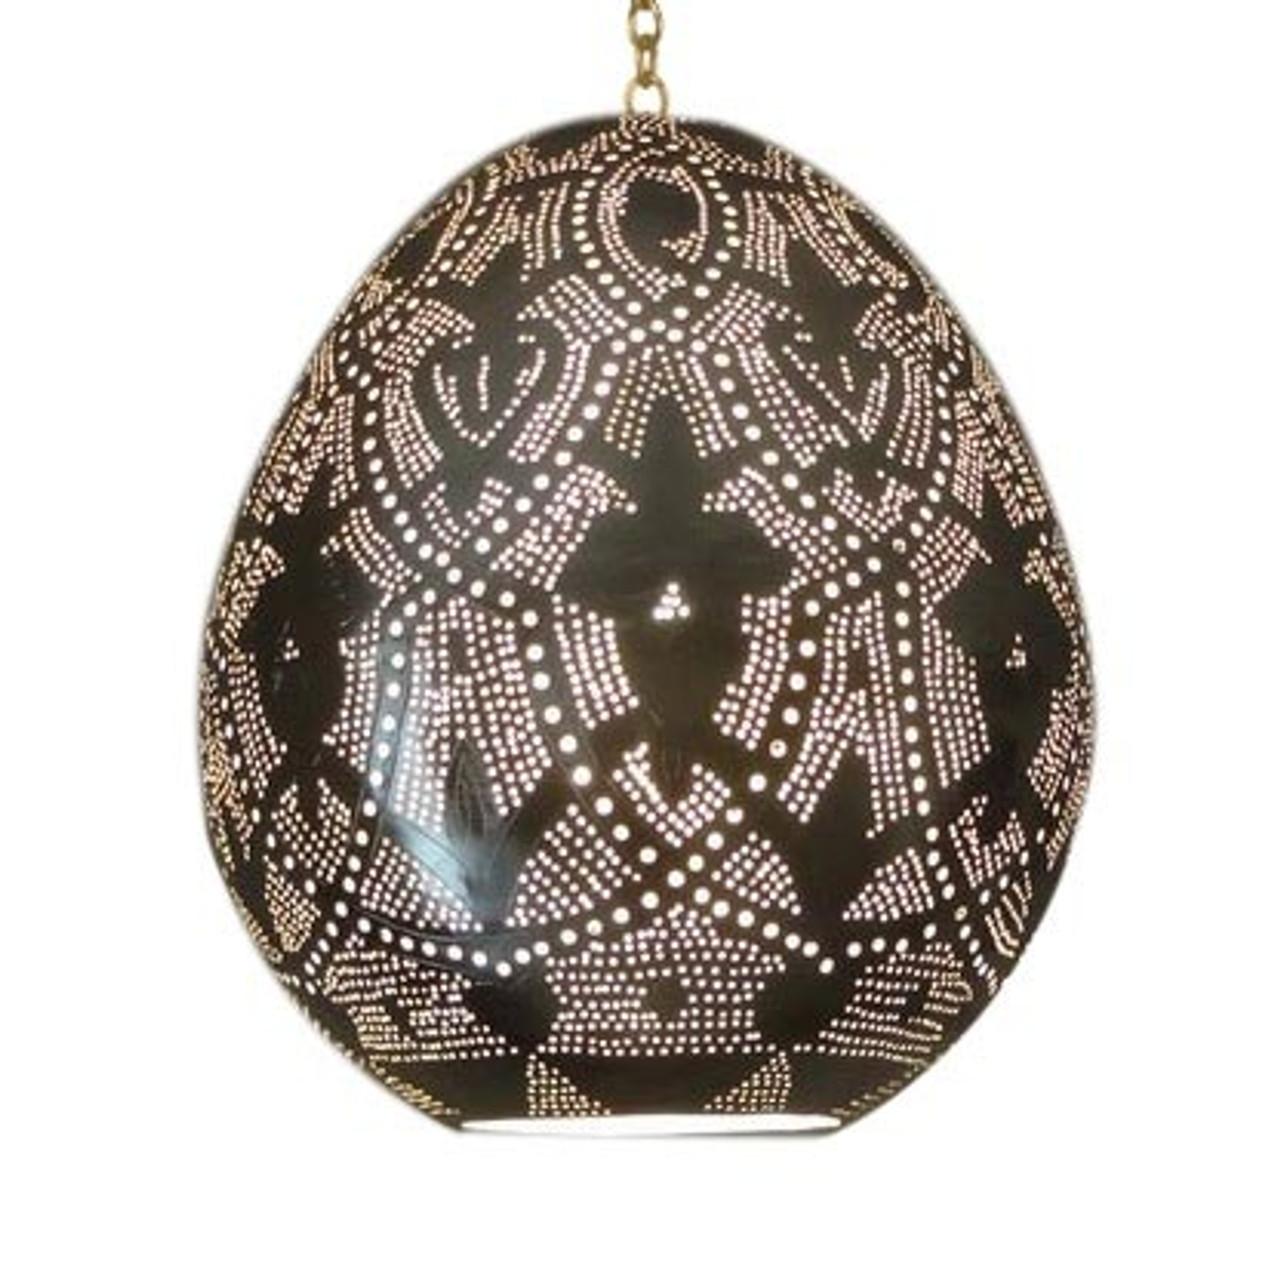 Moroccan hanging lamp moroccan pendant light moroccan pendant moroccan hanging lamp pendant light aloadofball Images